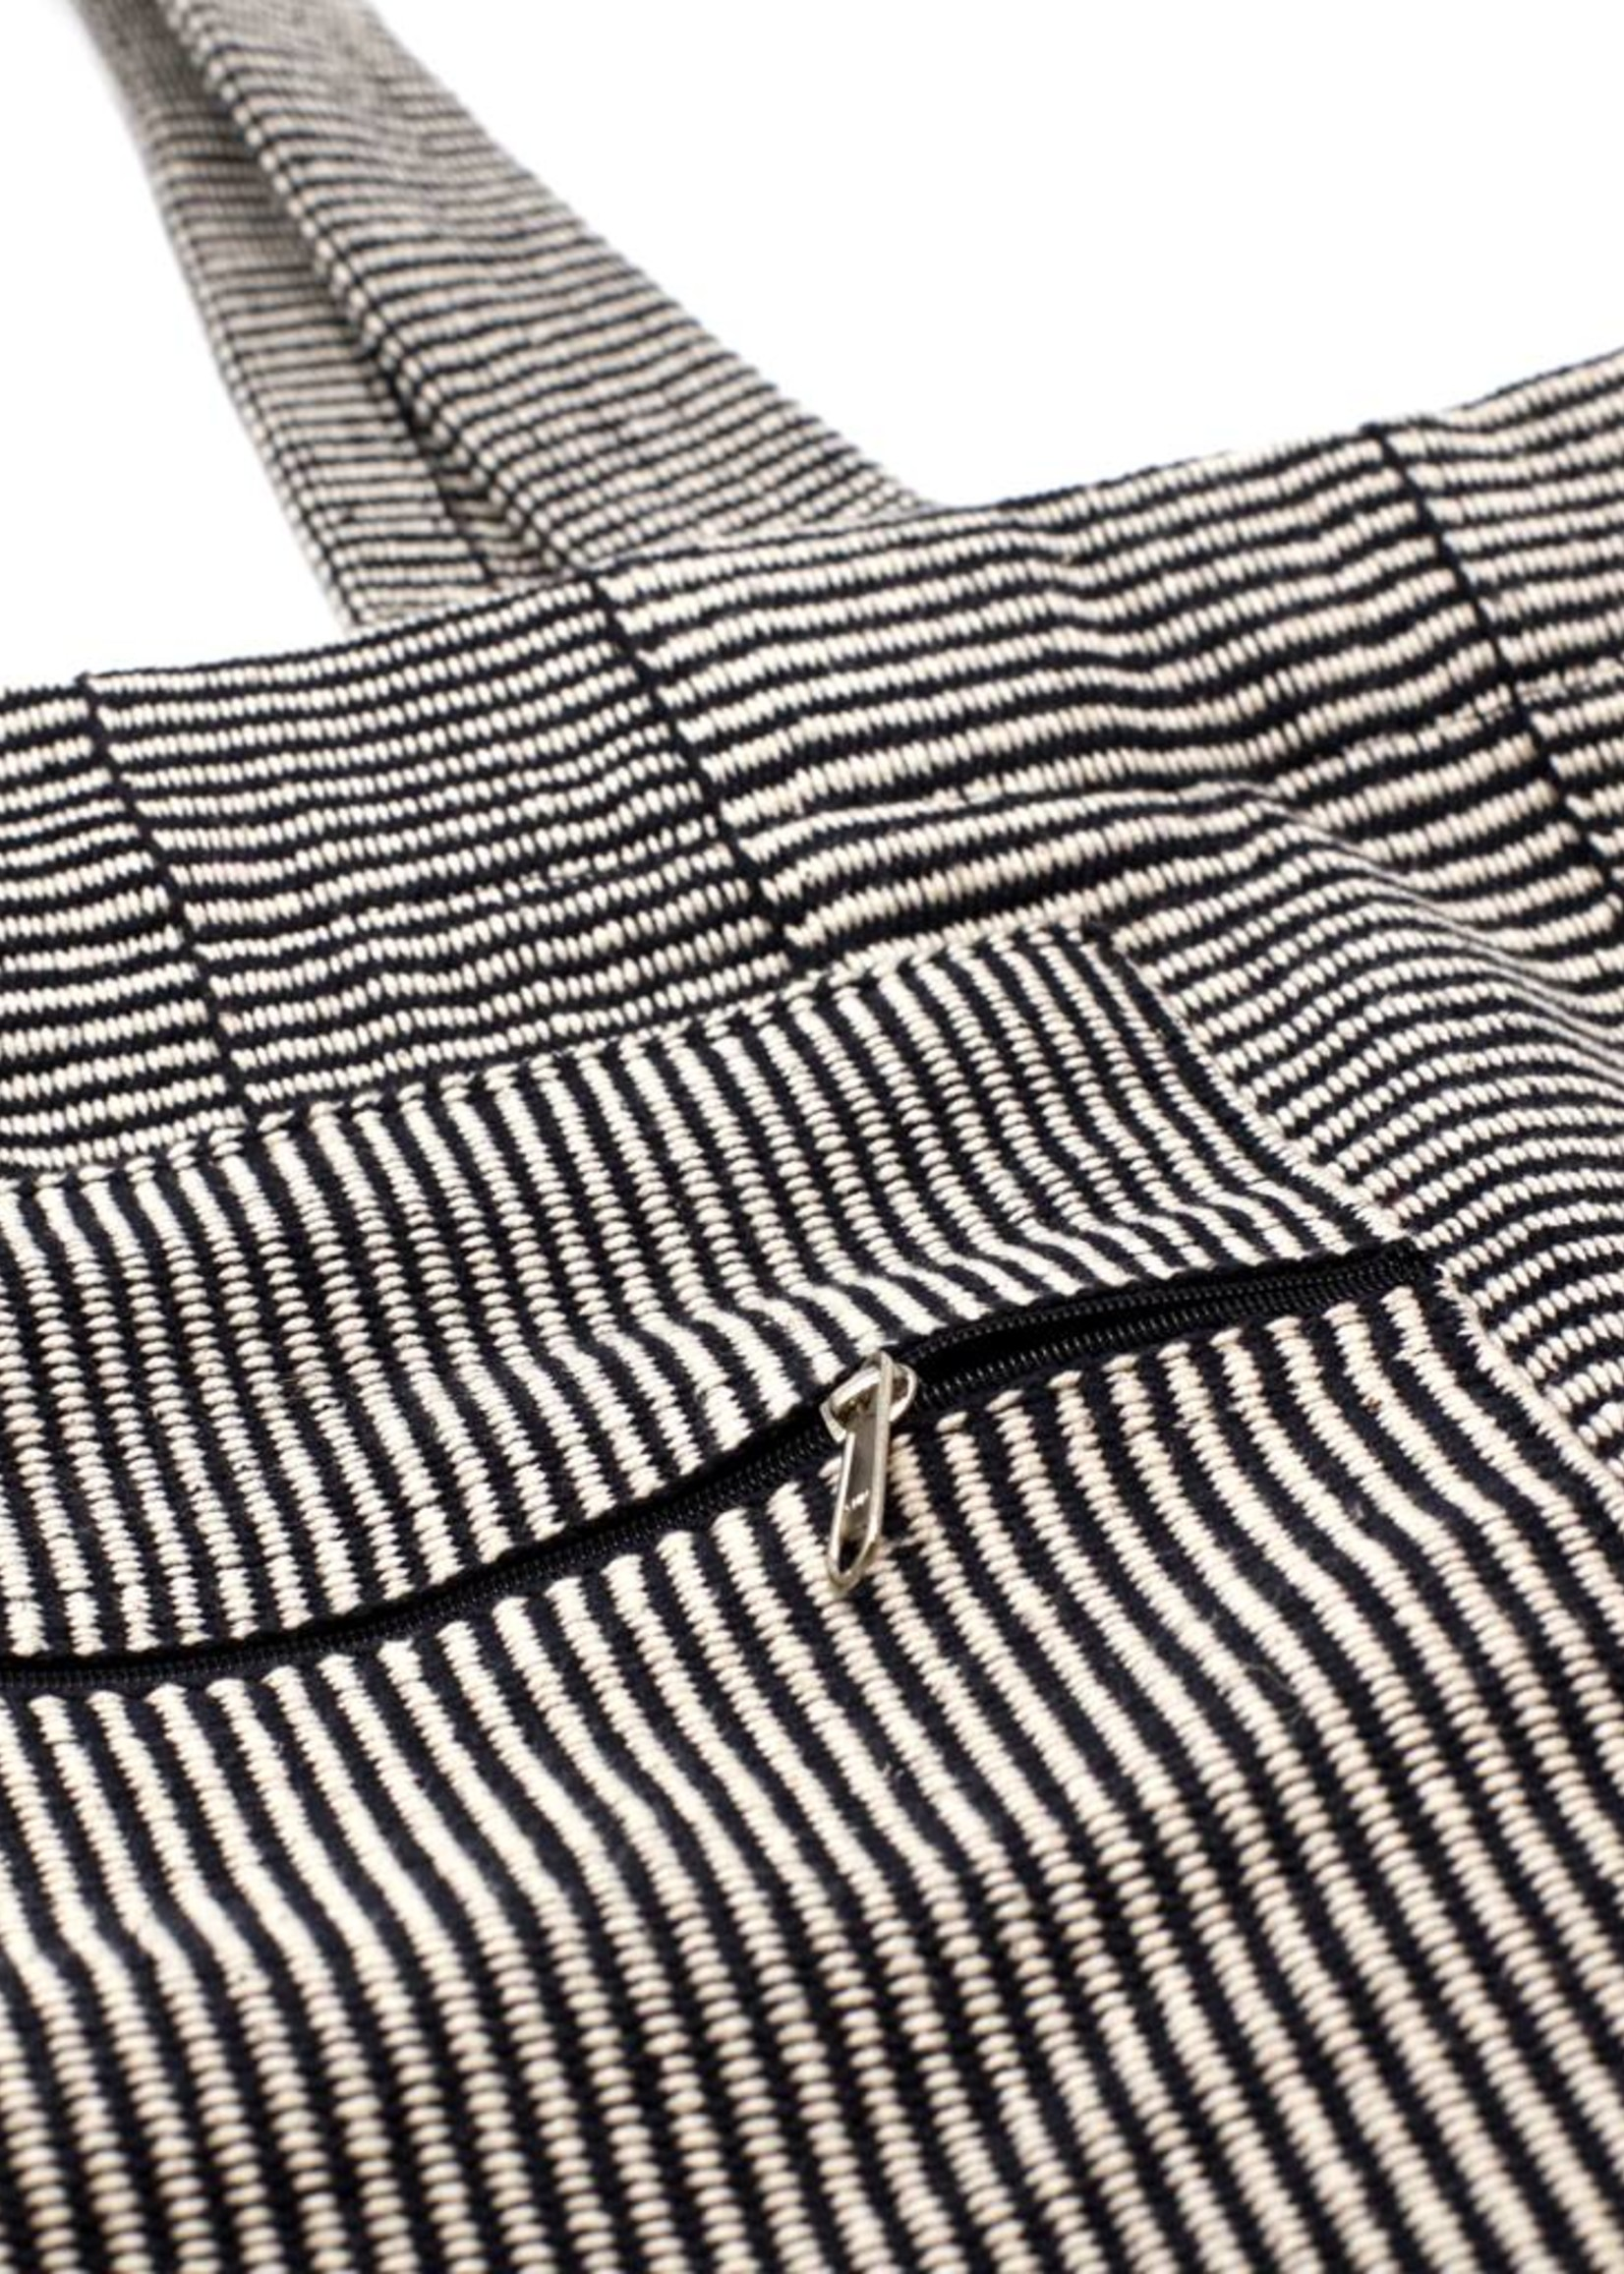 MESH Black & White Tote